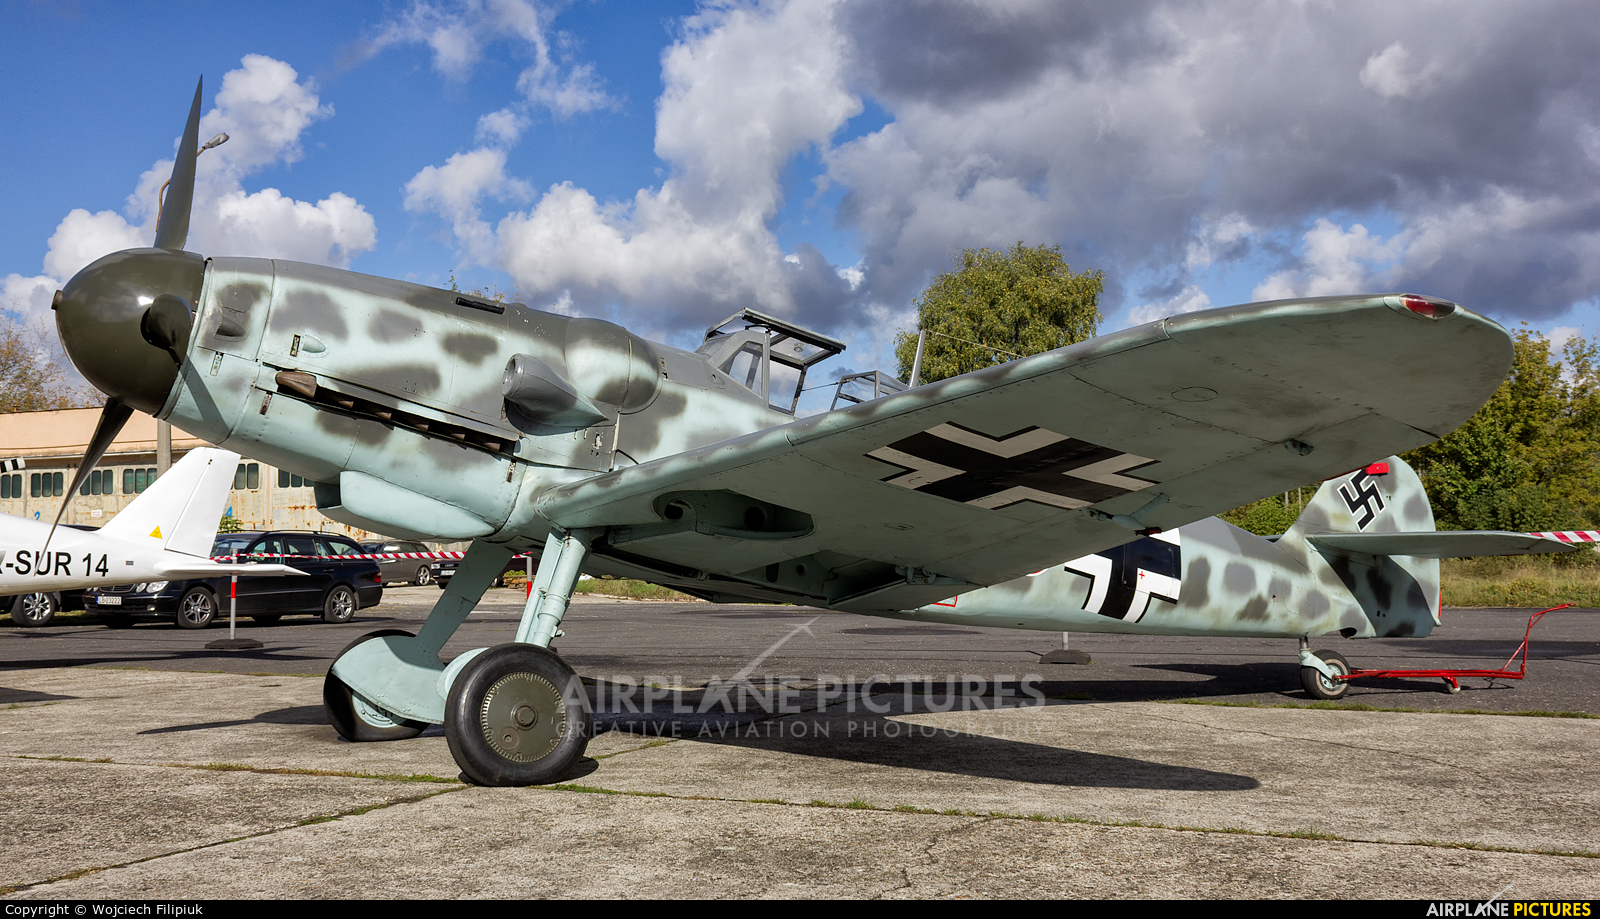 Polish Eagles Foundation 163306 aircraft at Biała Podlaska